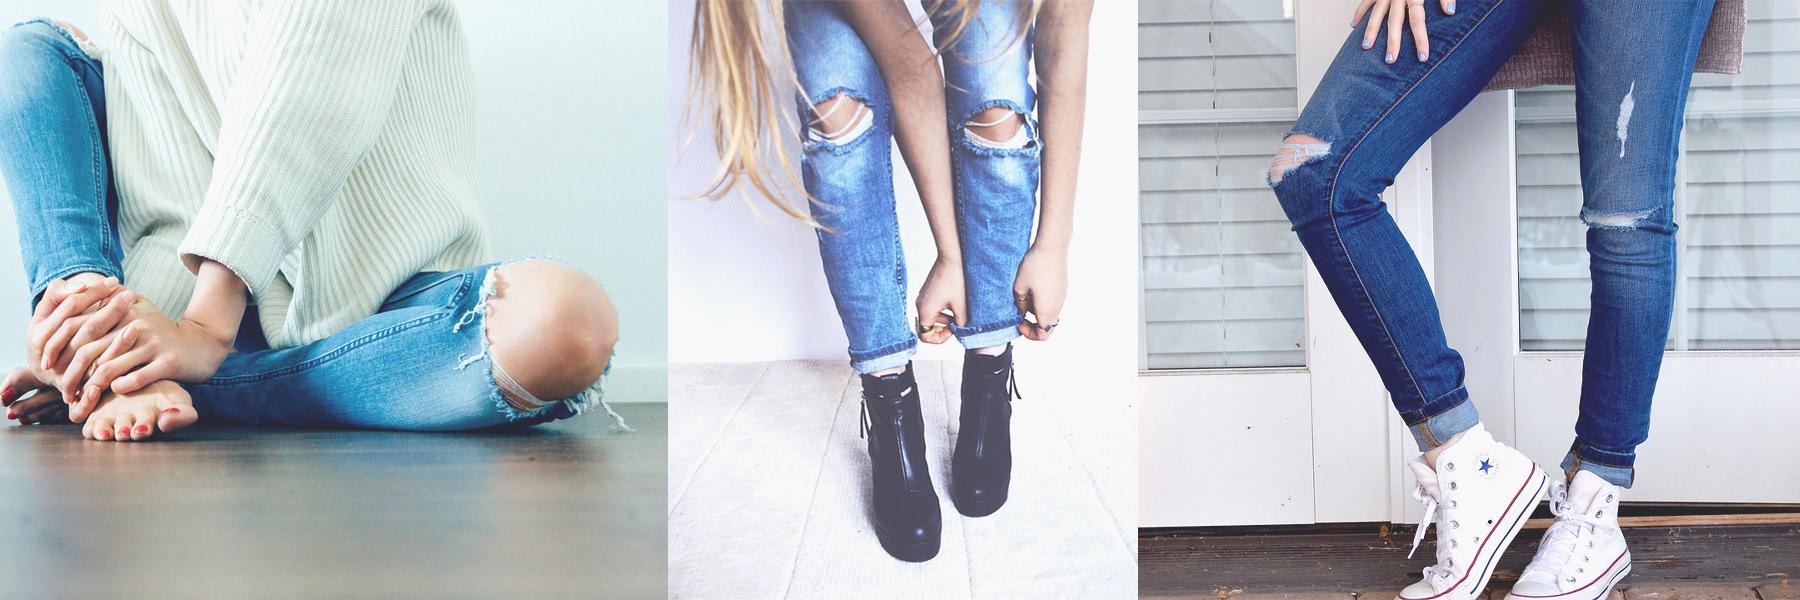 damen jeans g nstig auf rechnung bestellen im jeans outlet. Black Bedroom Furniture Sets. Home Design Ideas